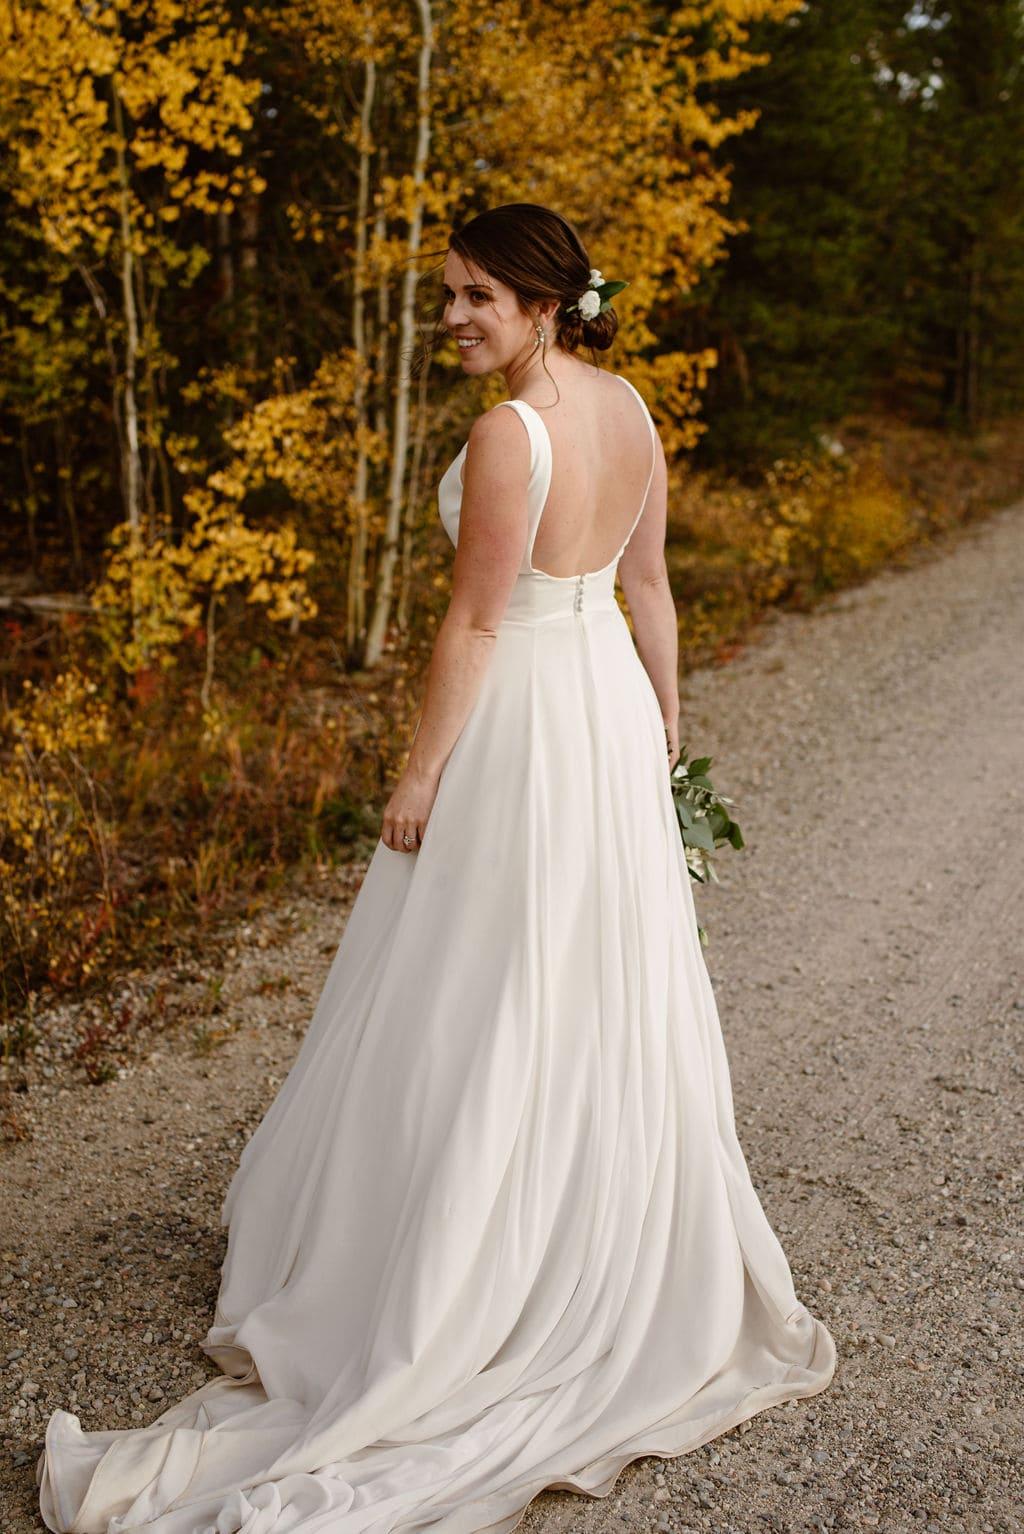 Bridal Portraits With Colorado Fall Colors